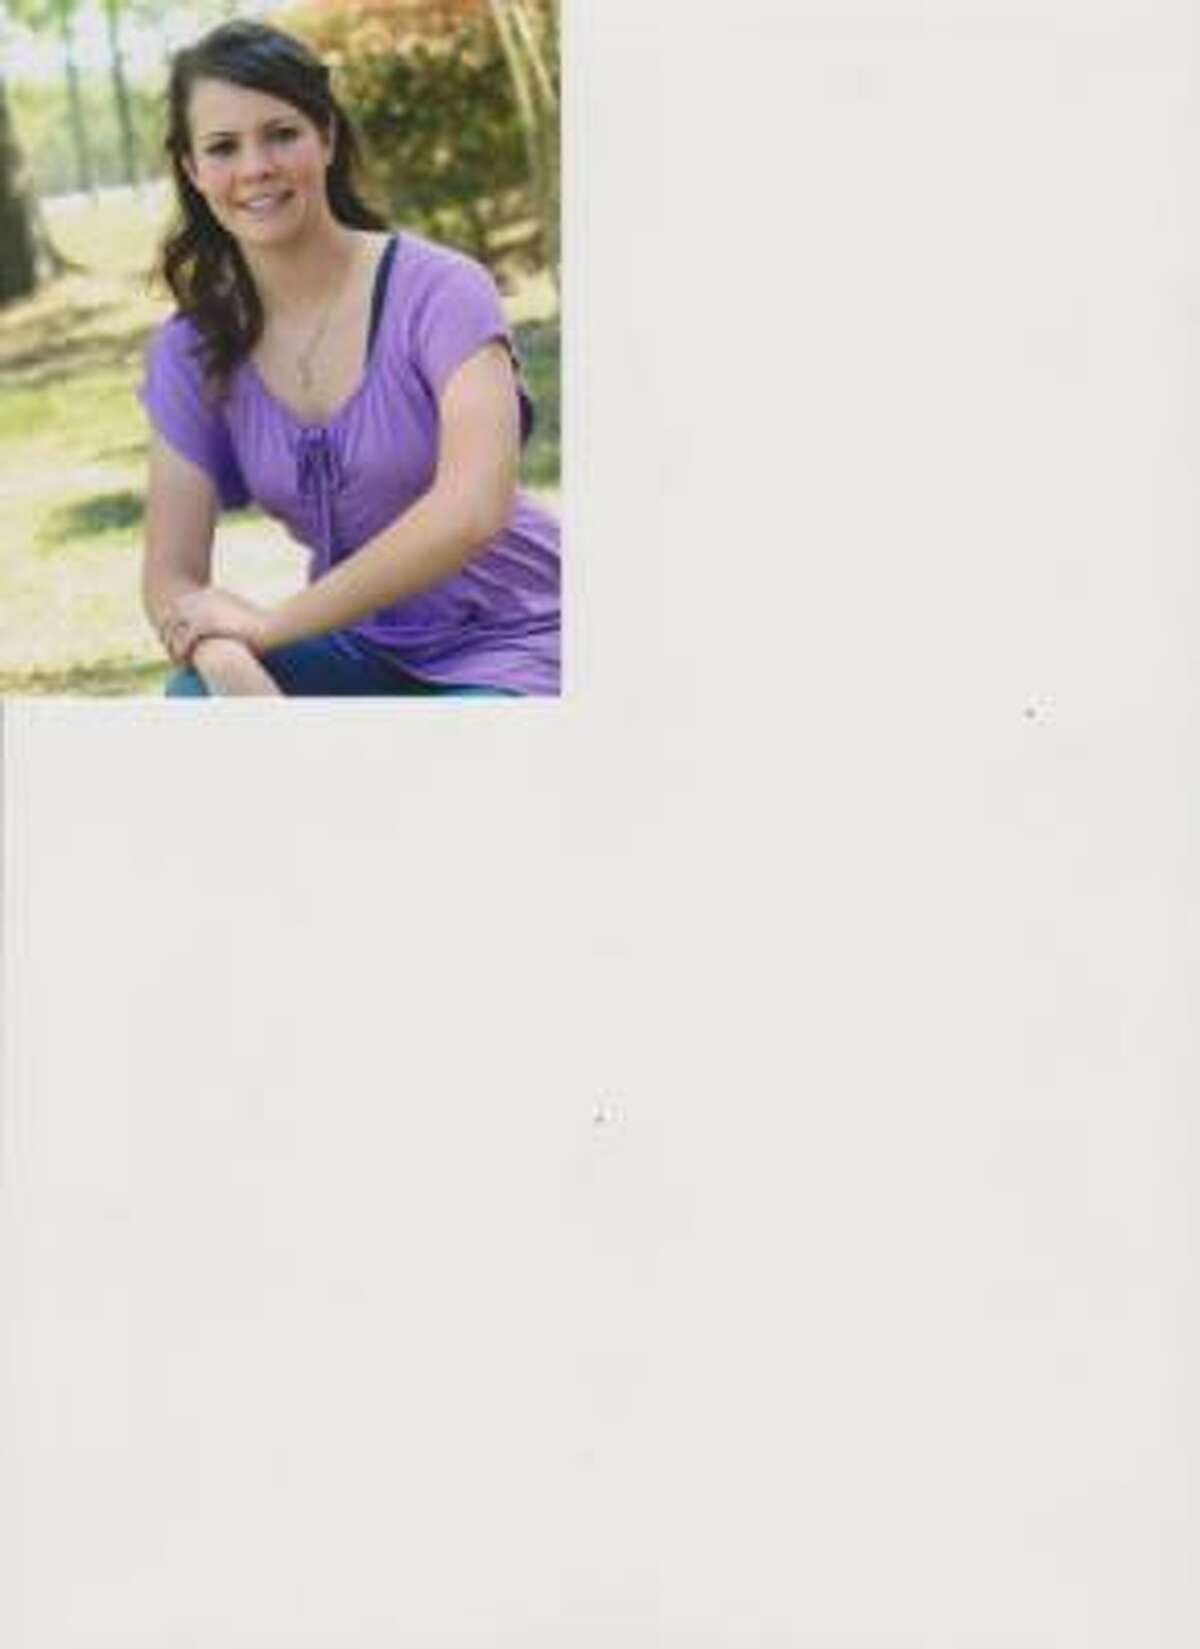 Rebekah Audrey Keel Caney Creek High School Salutatorian College: Bryn Mawr College